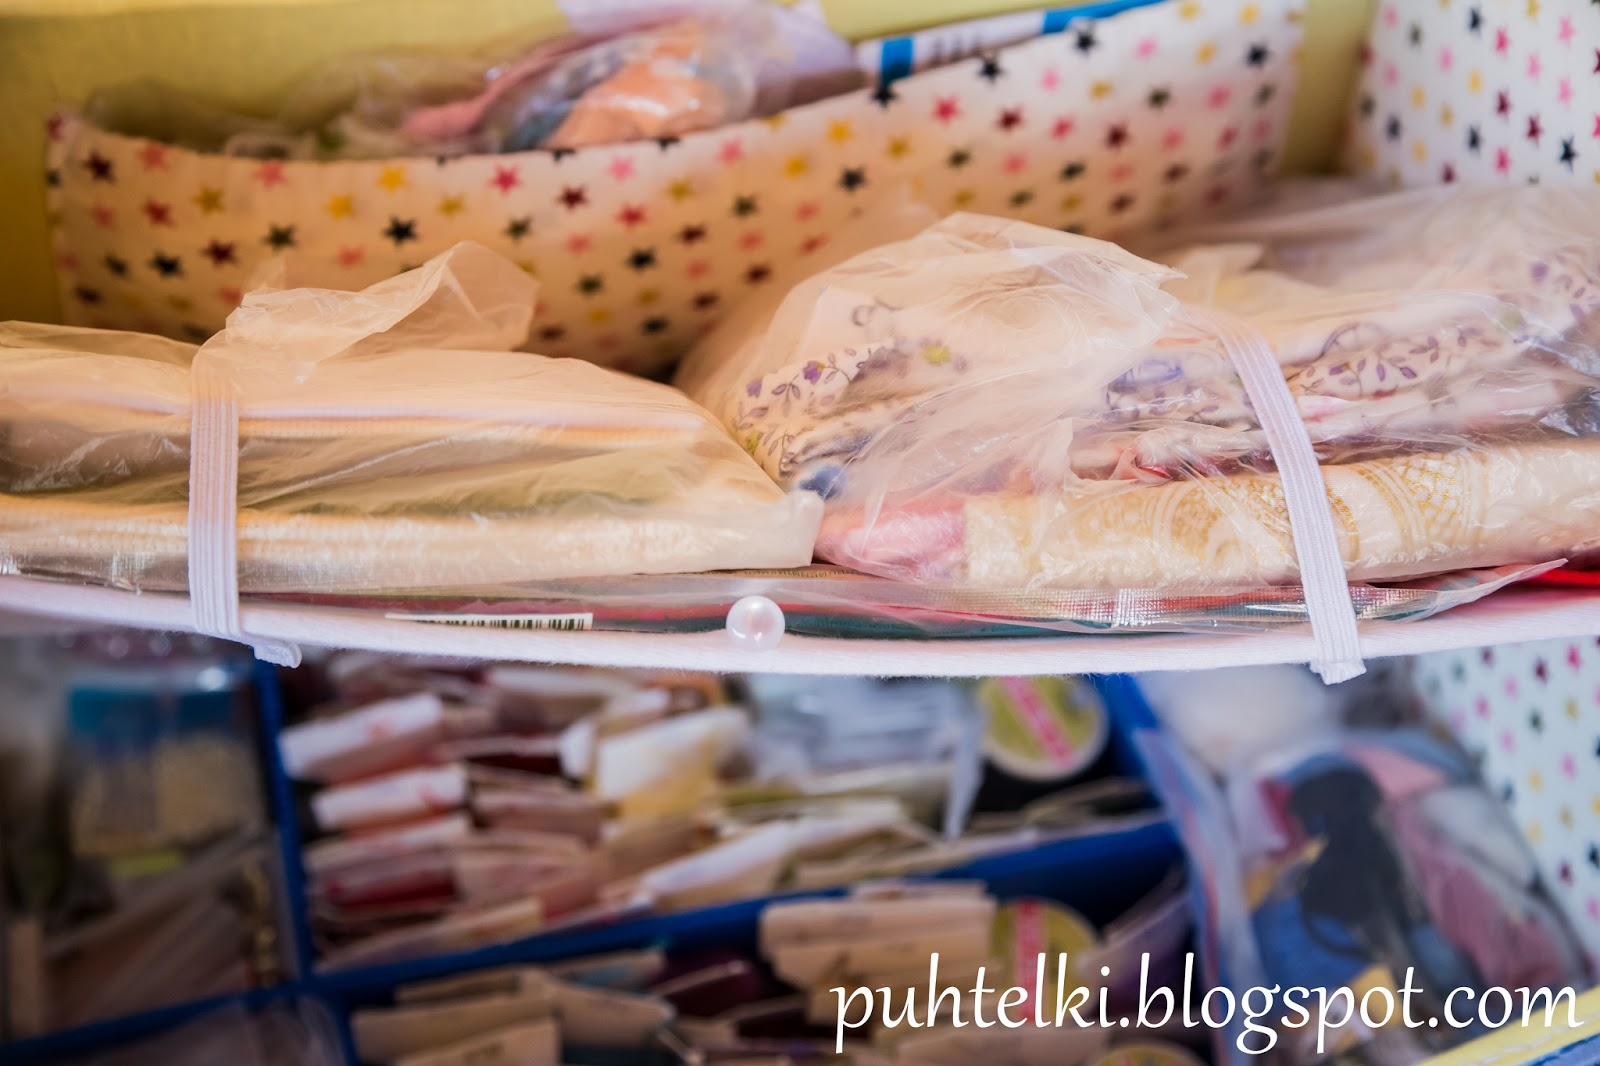 Case for needlework staff